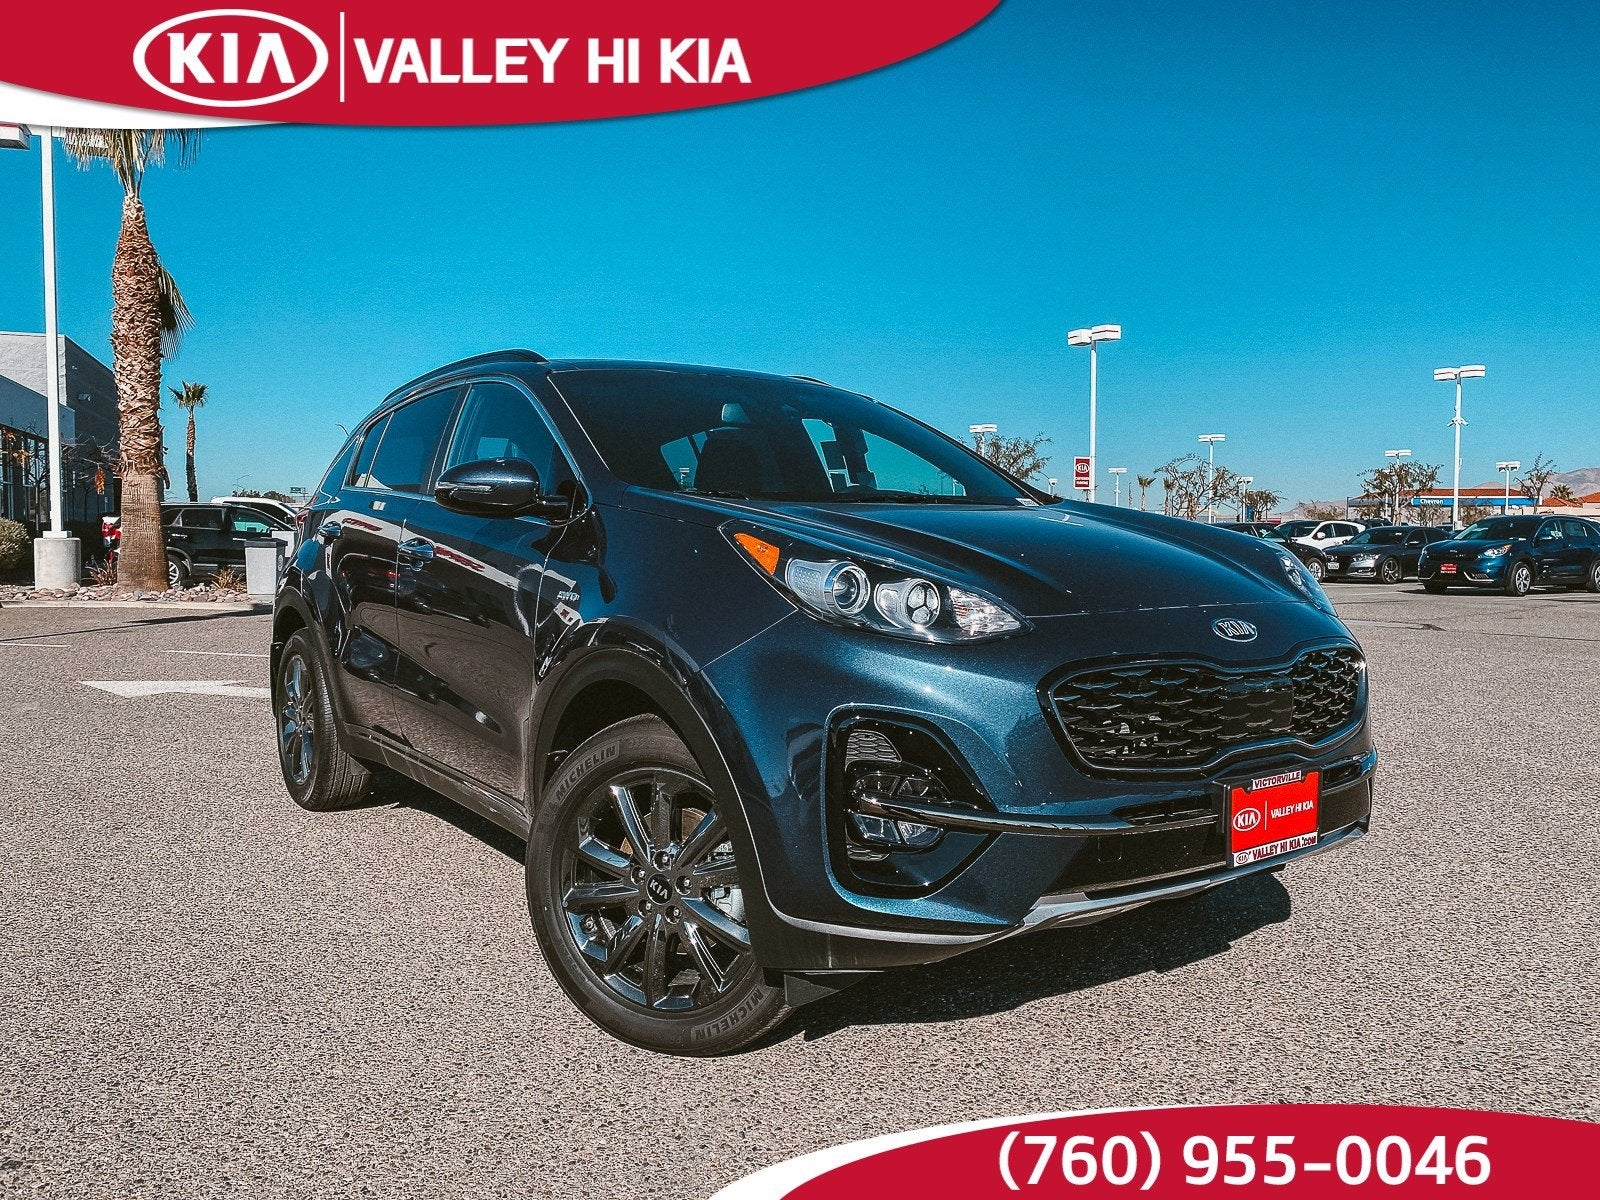 Valley Hi Kia >> Kia Vehicle Inventory Victorville Kia Dealer In